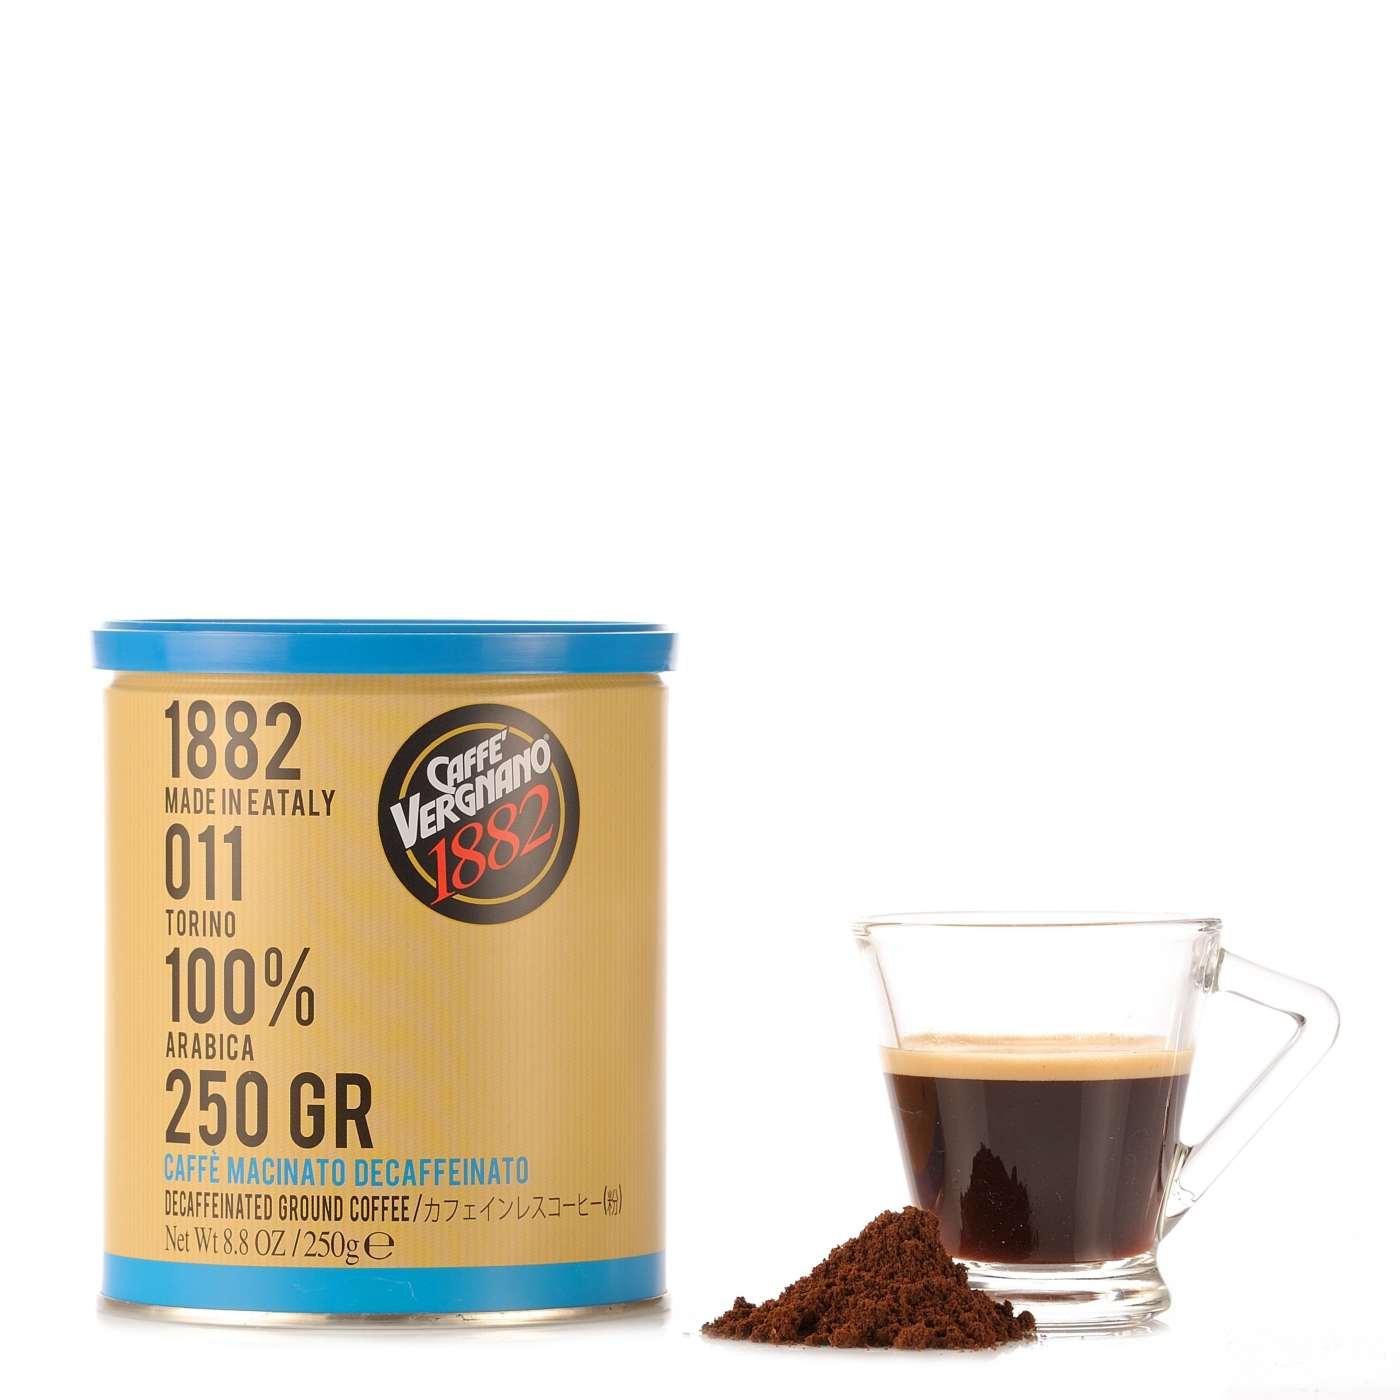 Vergnano Caffè Macinato Decaffeinato 250g